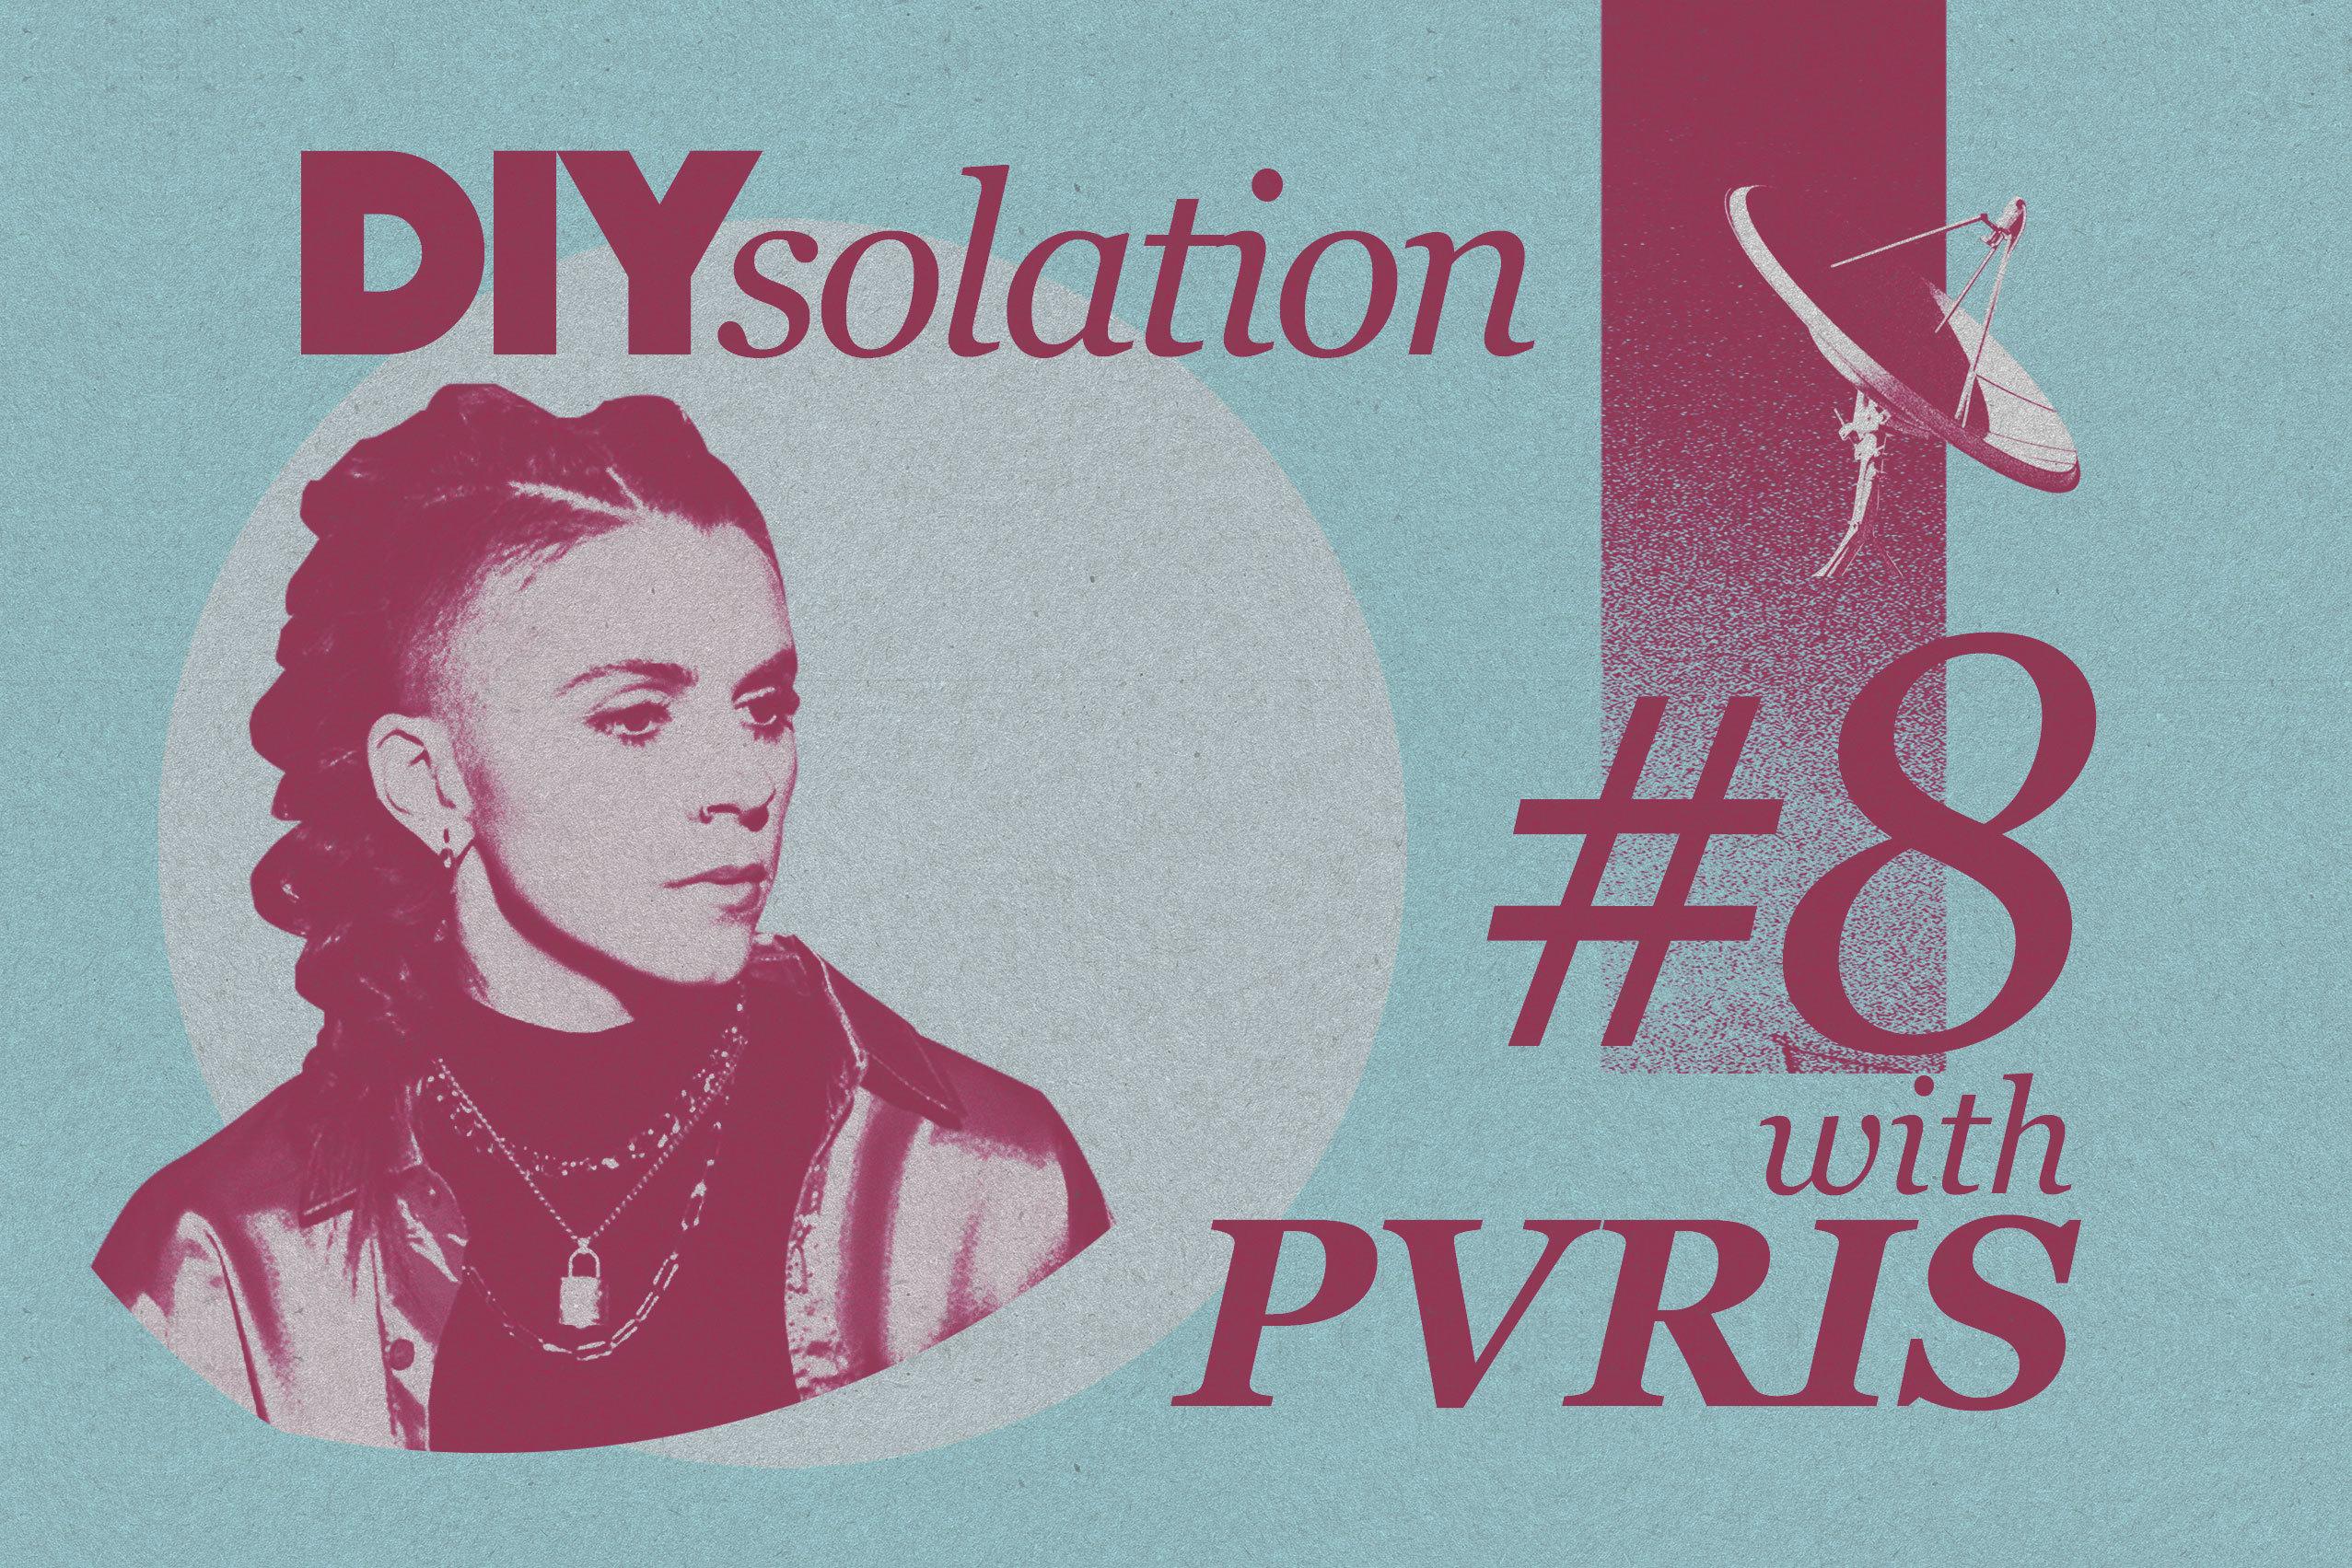 DIYsolation: #8 with PVRIS